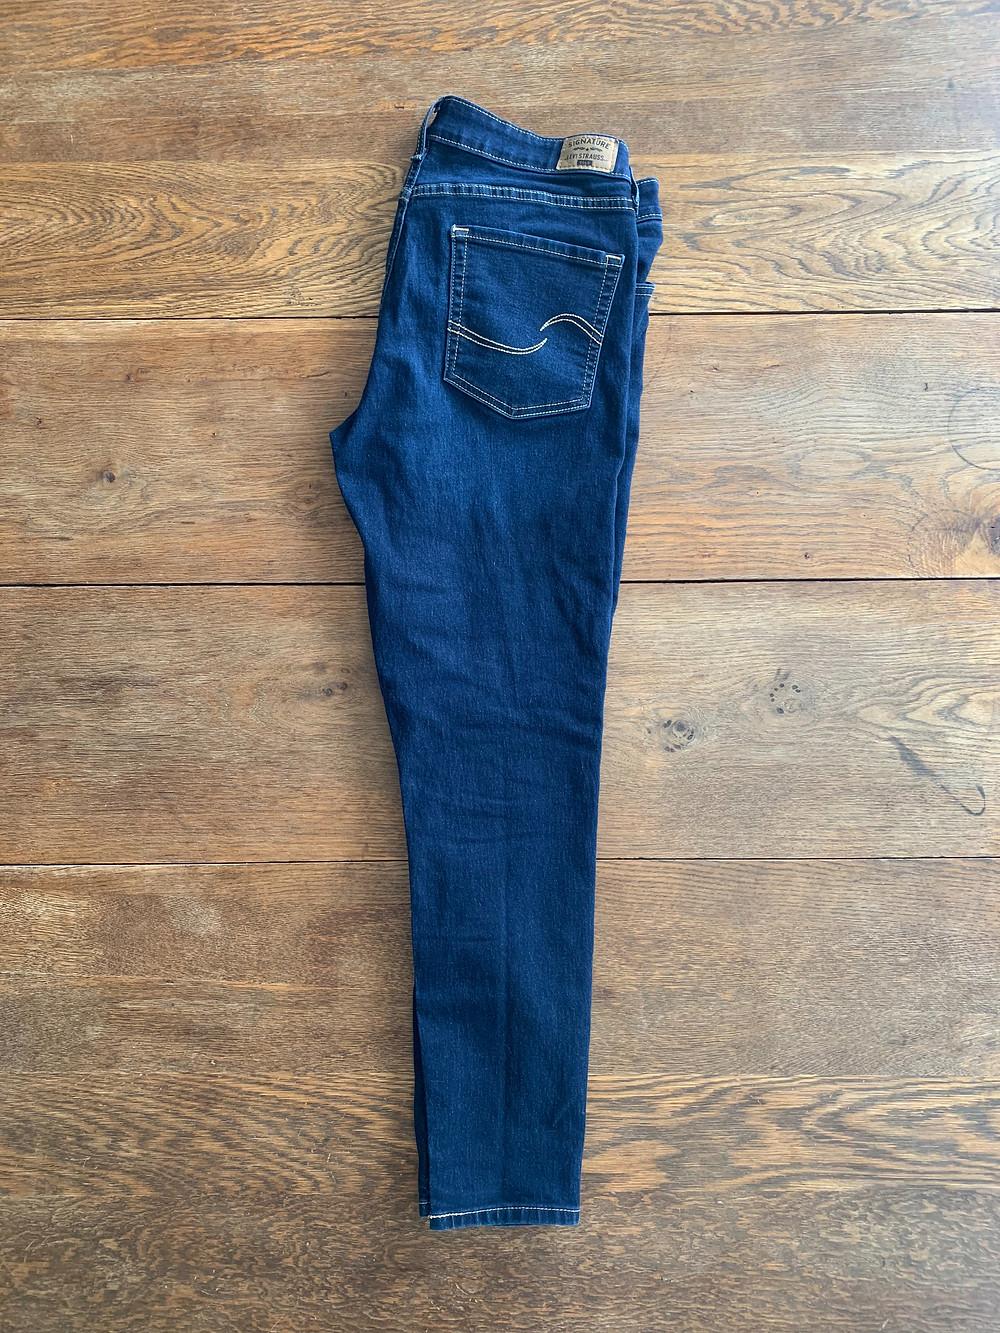 levi, levis, jeans, jean, womens, women, clothing, fashion, amazon, blog